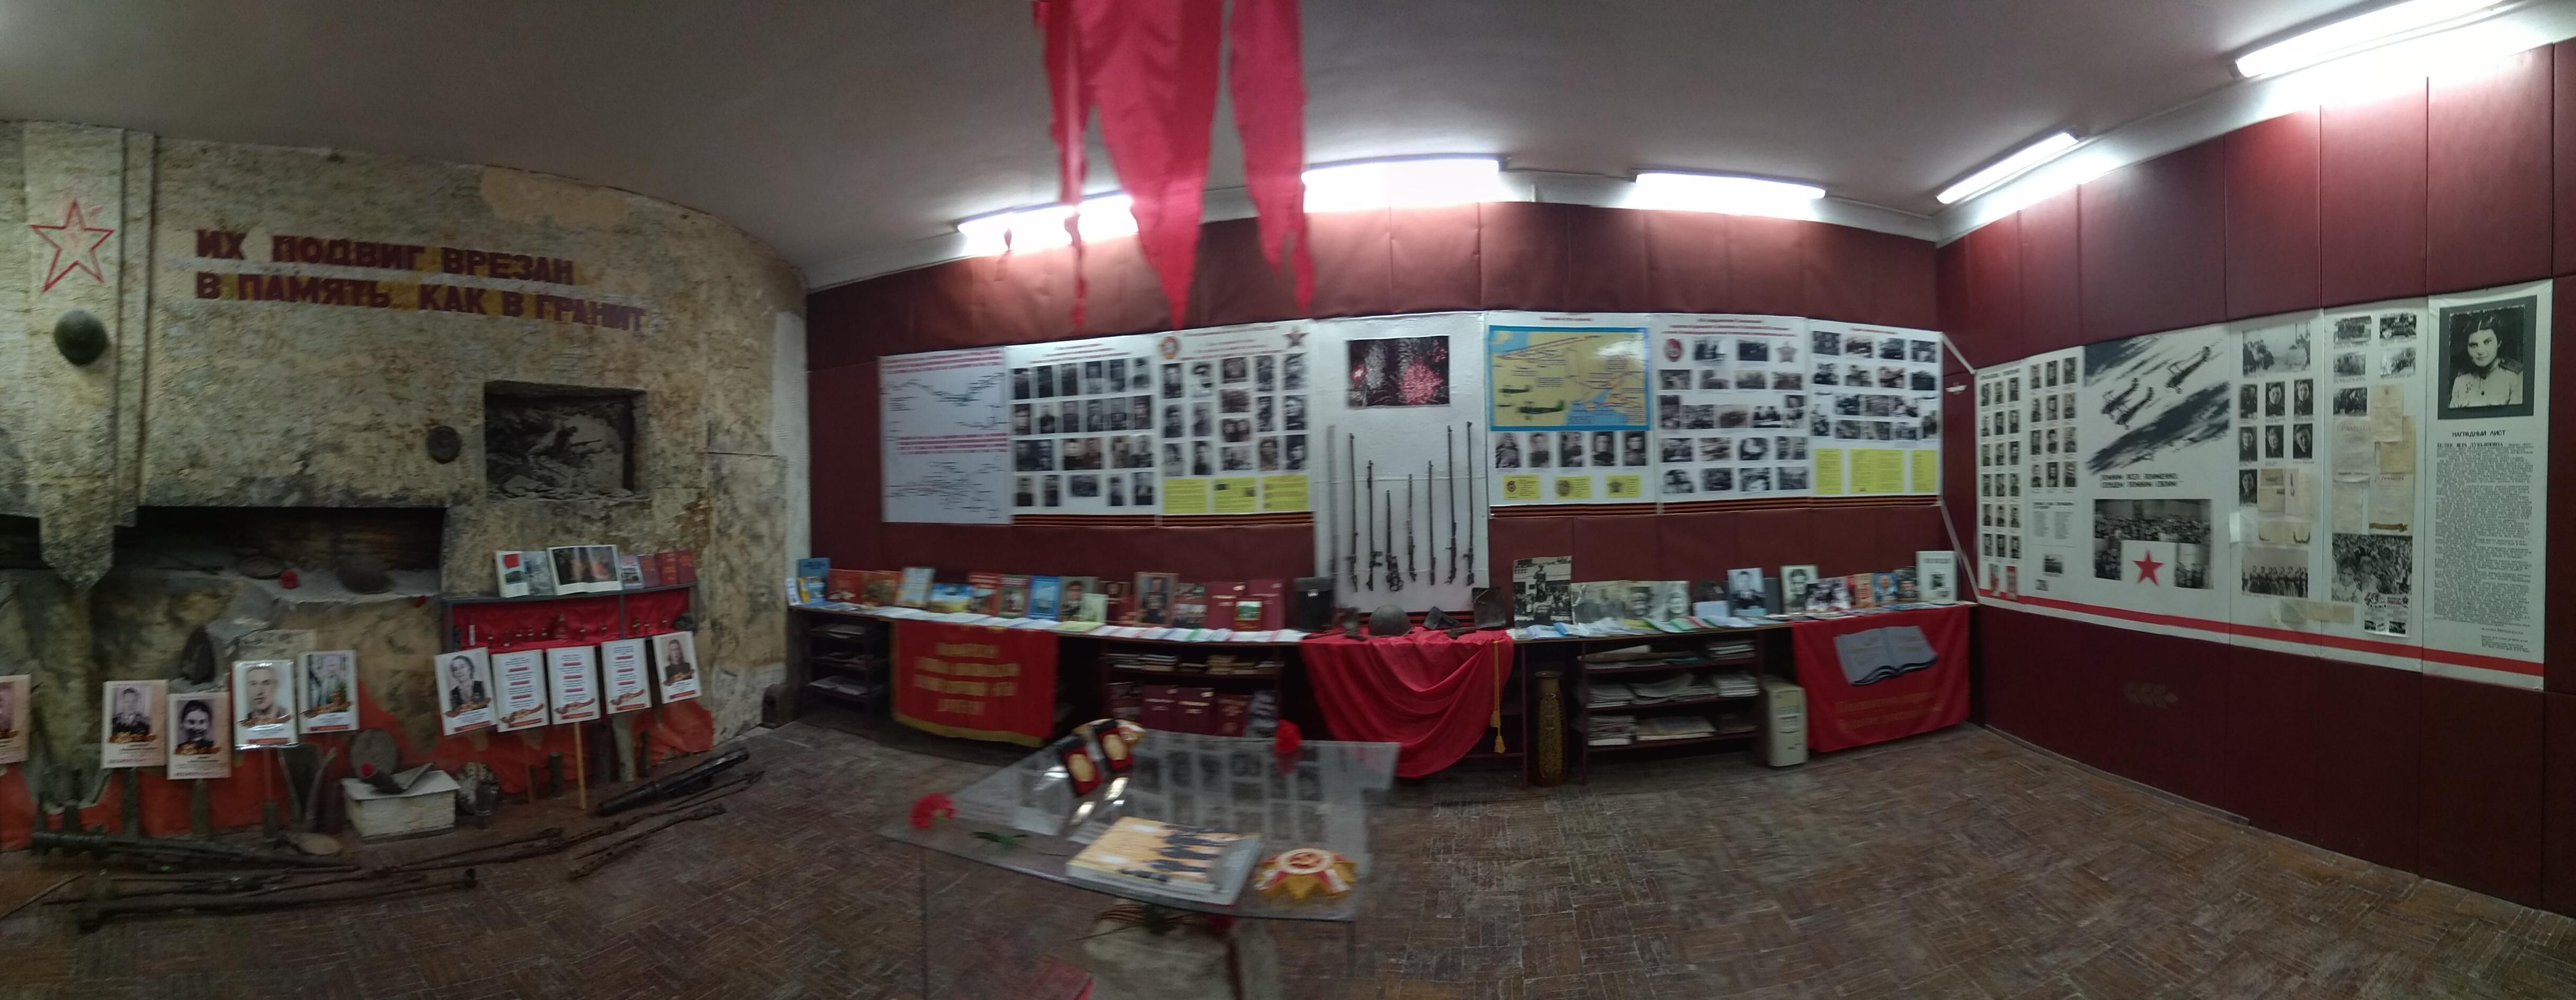 Музей школы № 17 г. Керчи